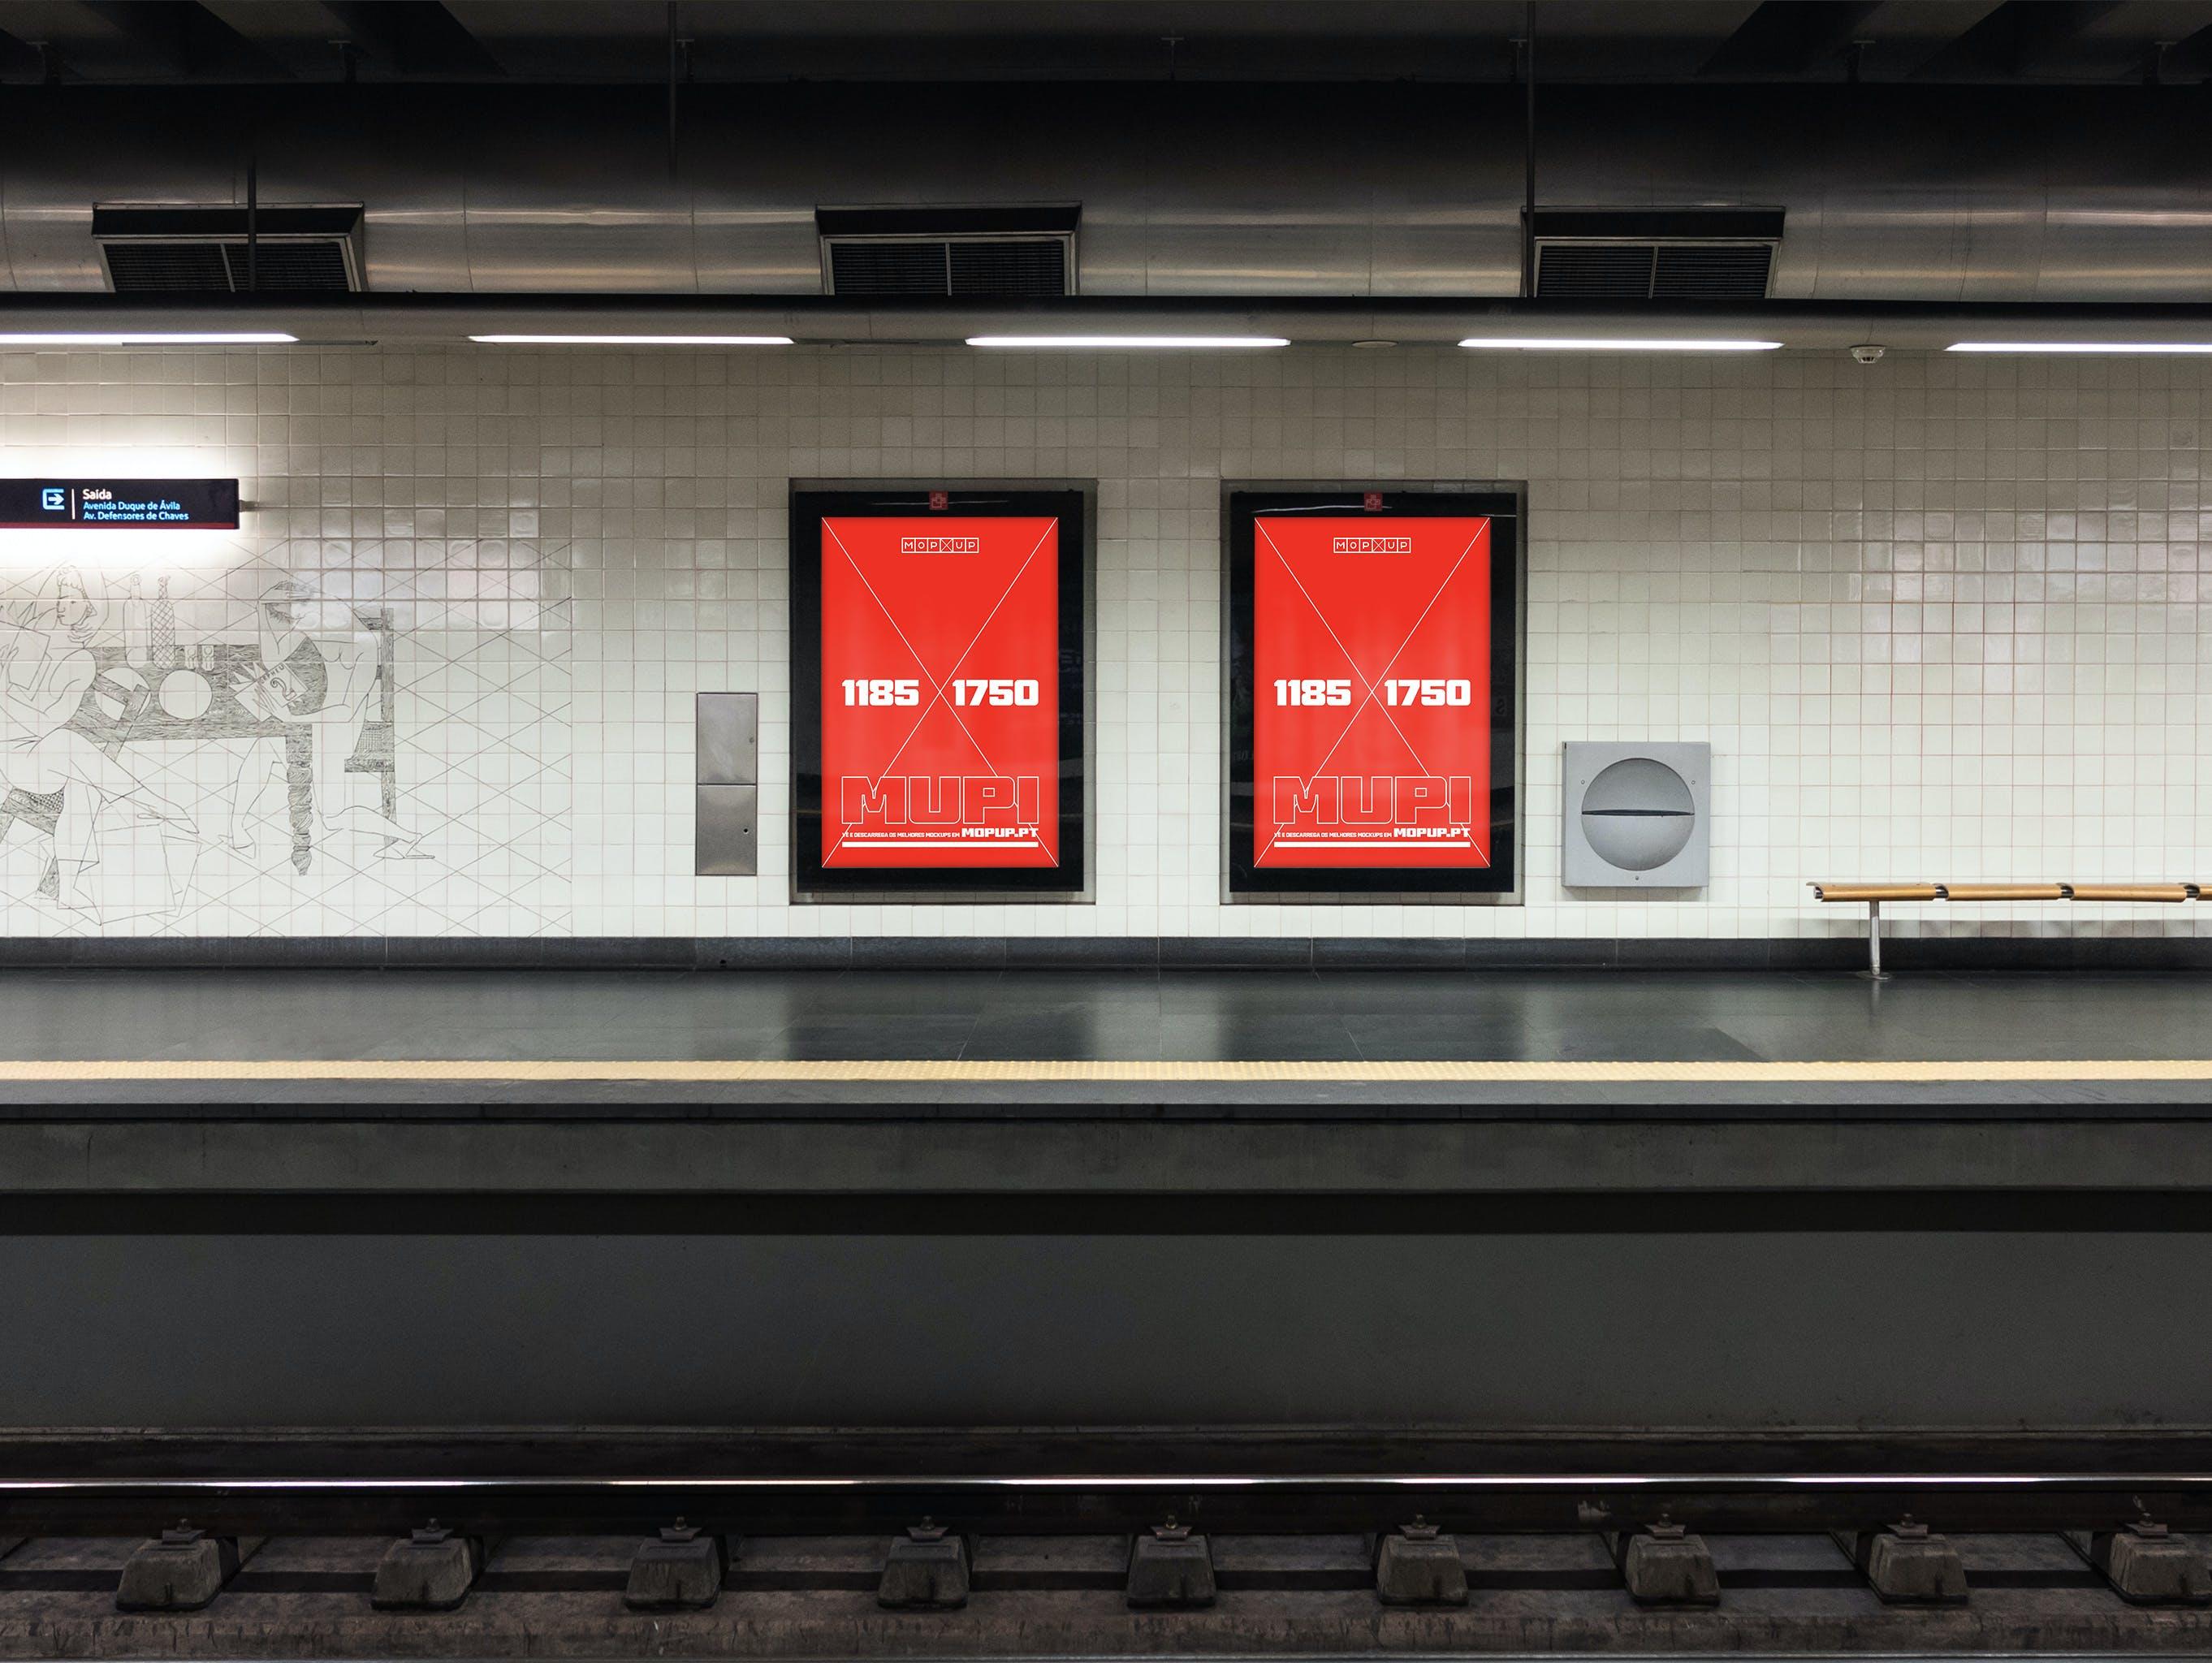 MOPUP - Mupi Metro Saldanha - Mockup